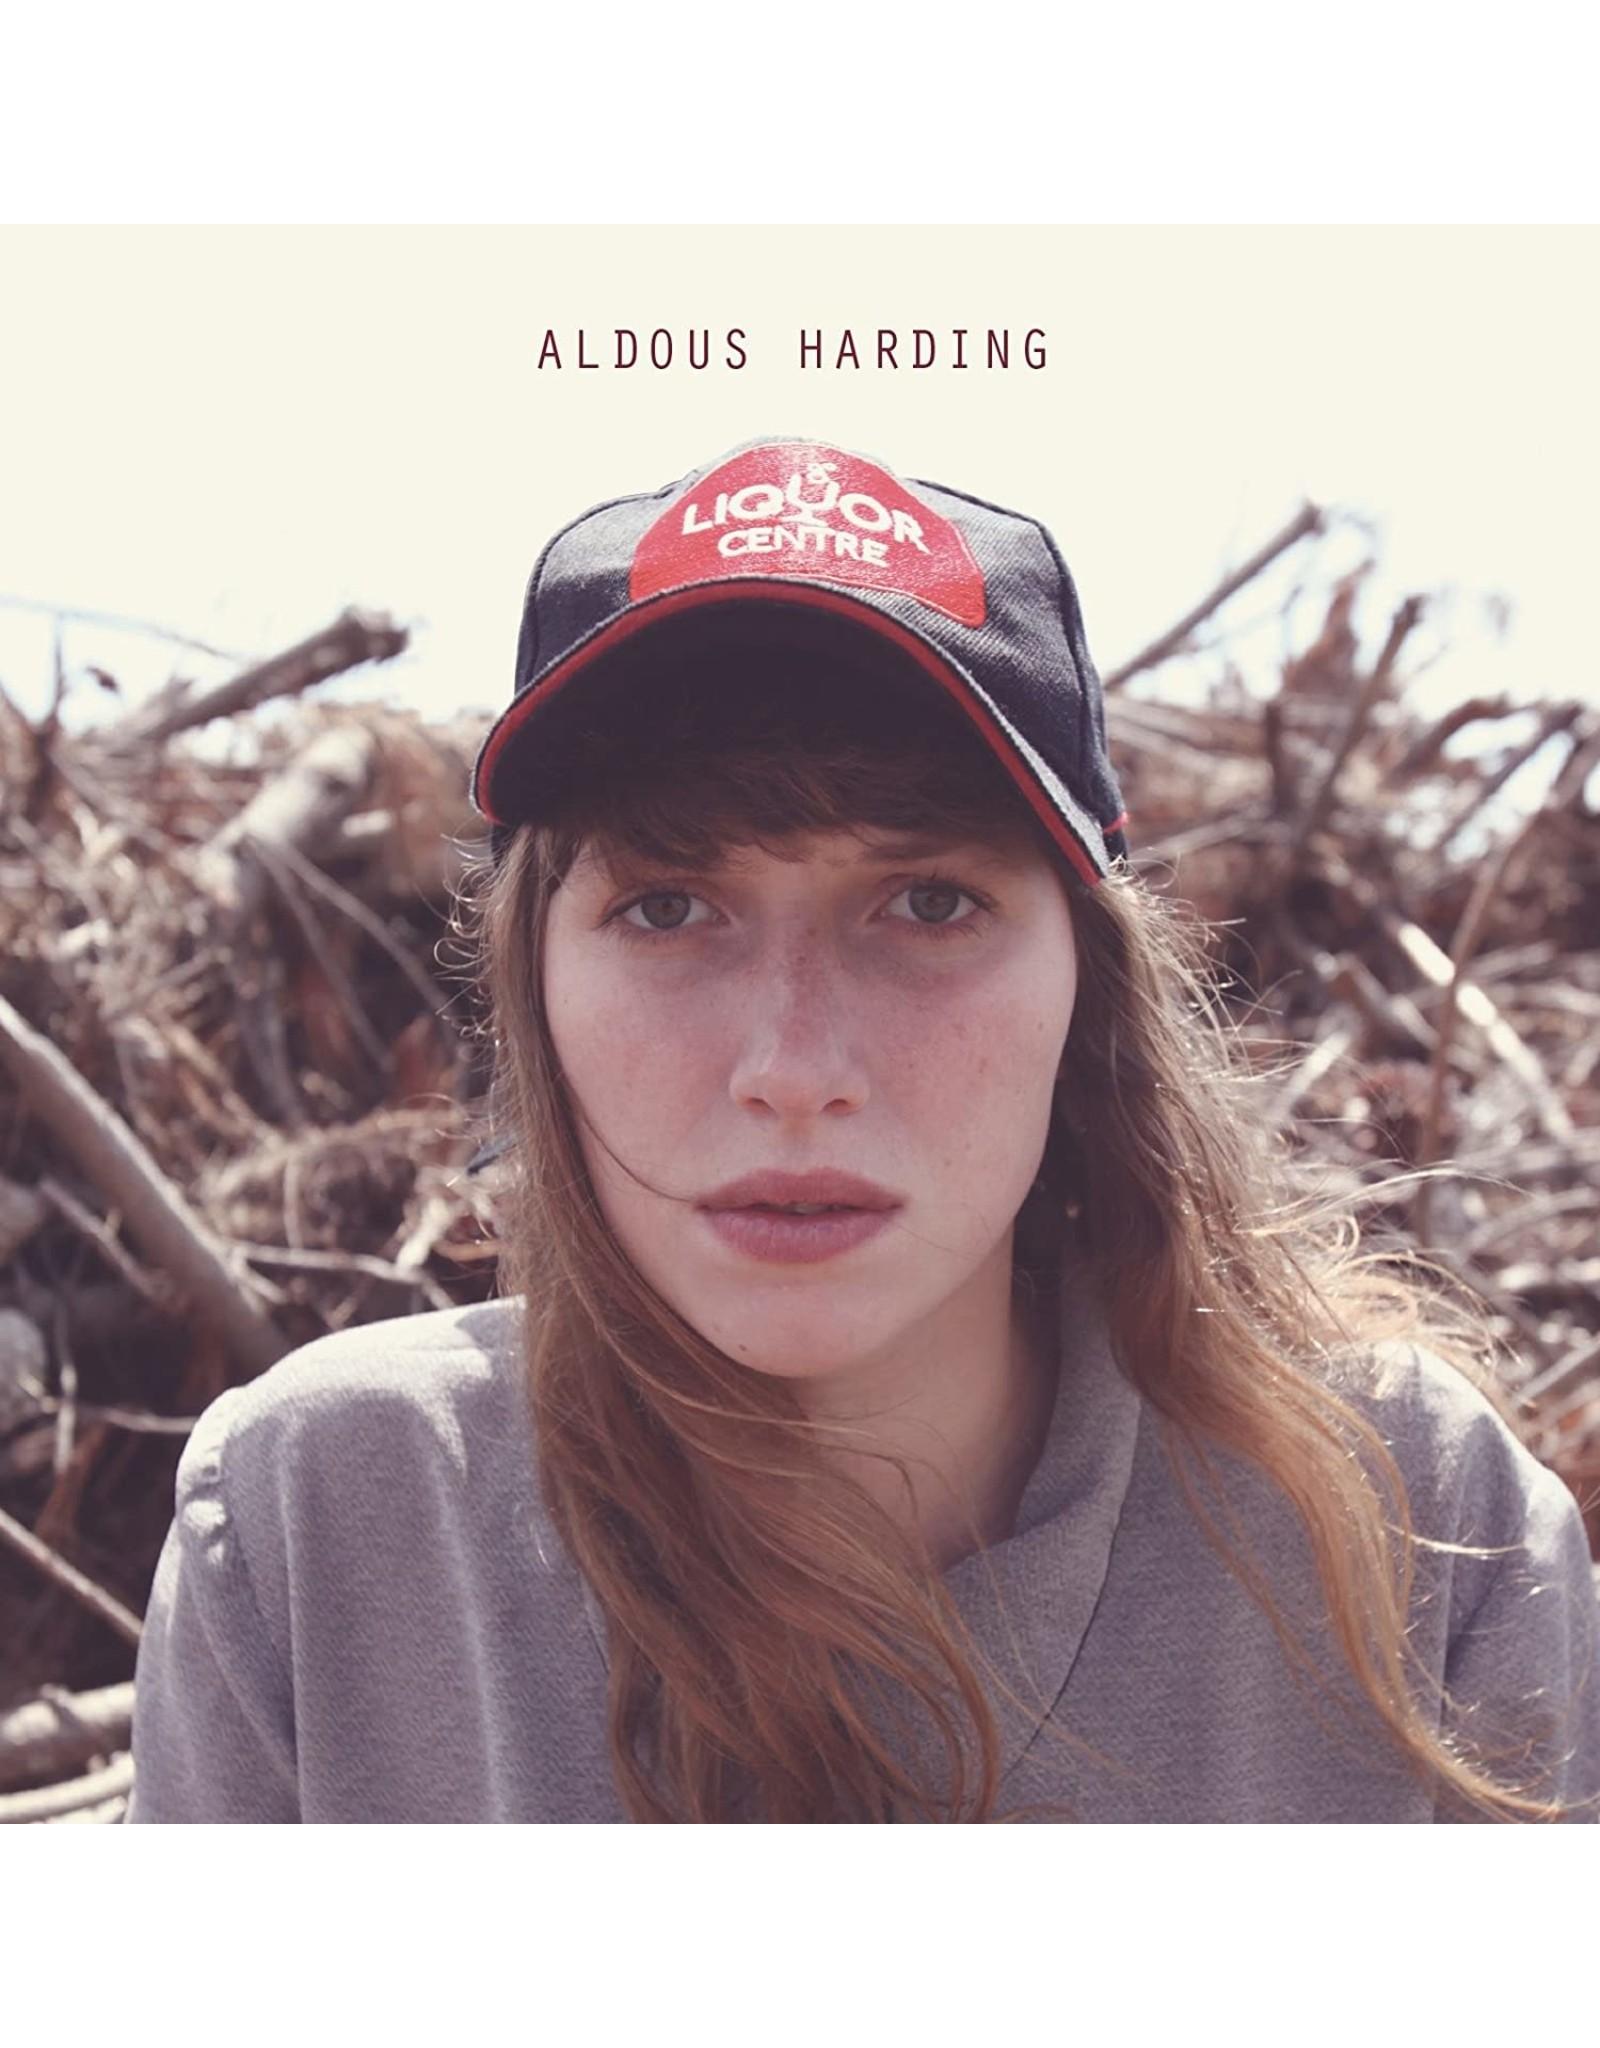 Aldous Harding - Aldous Harding